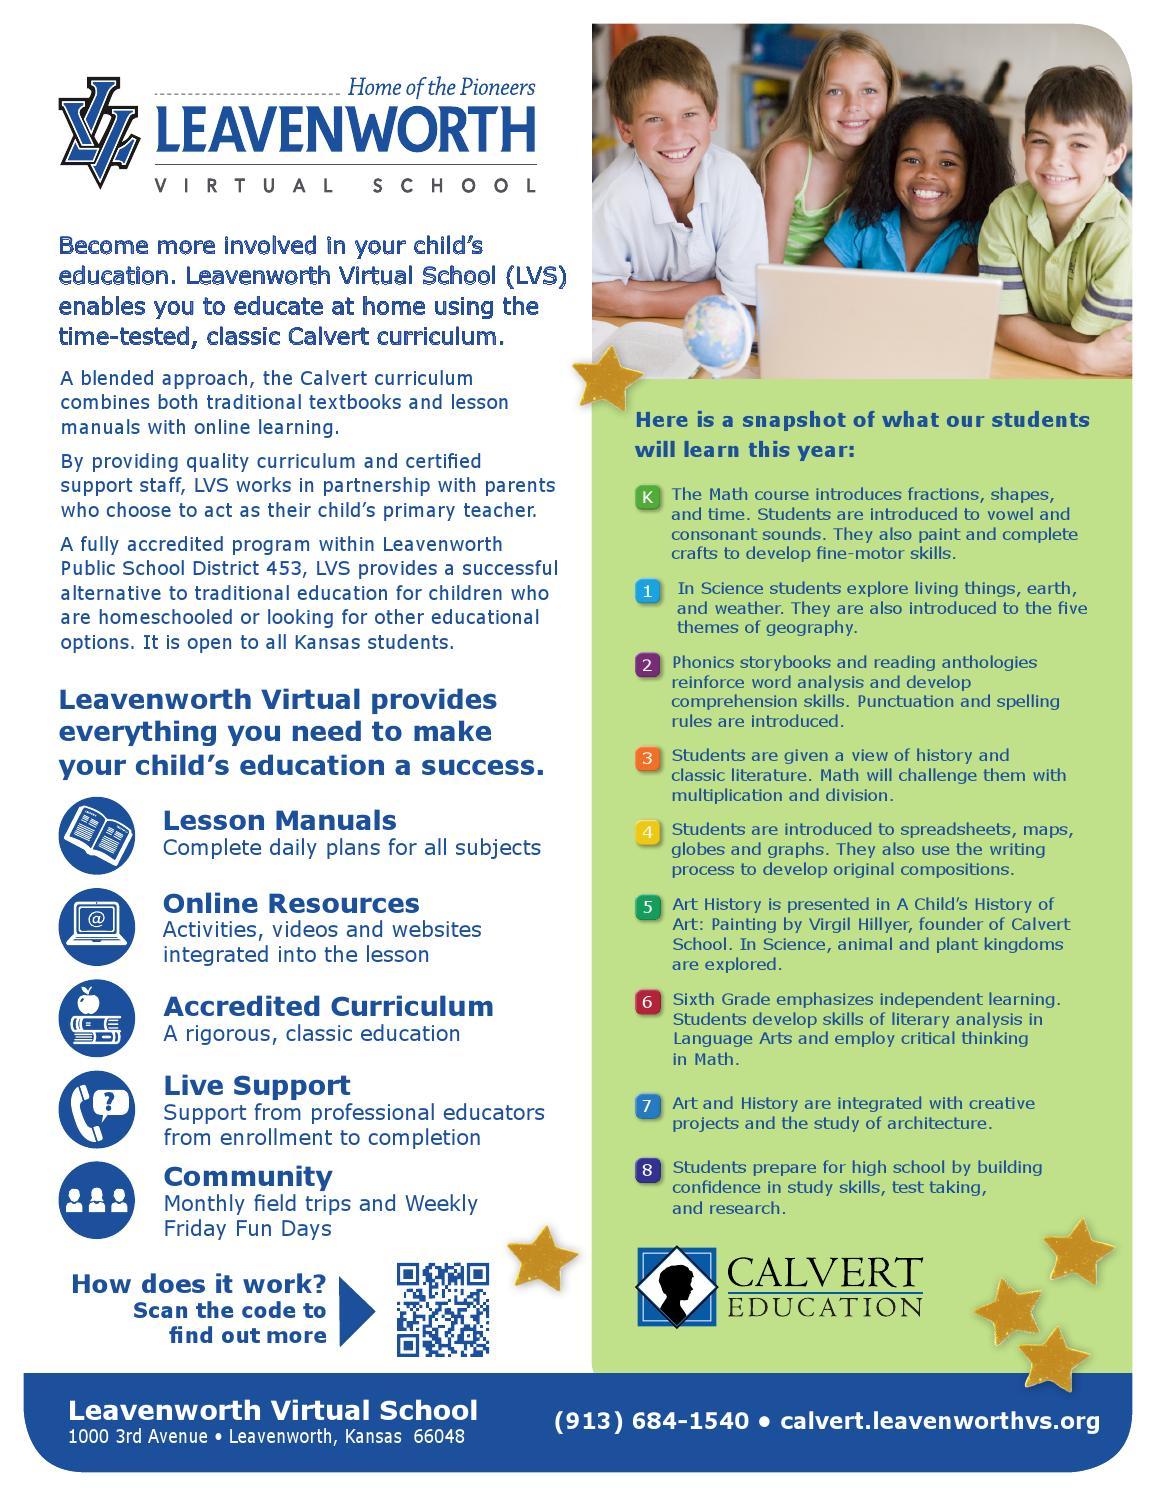 Leavenworth Virtual School Quick Facts By Calvert Education Services